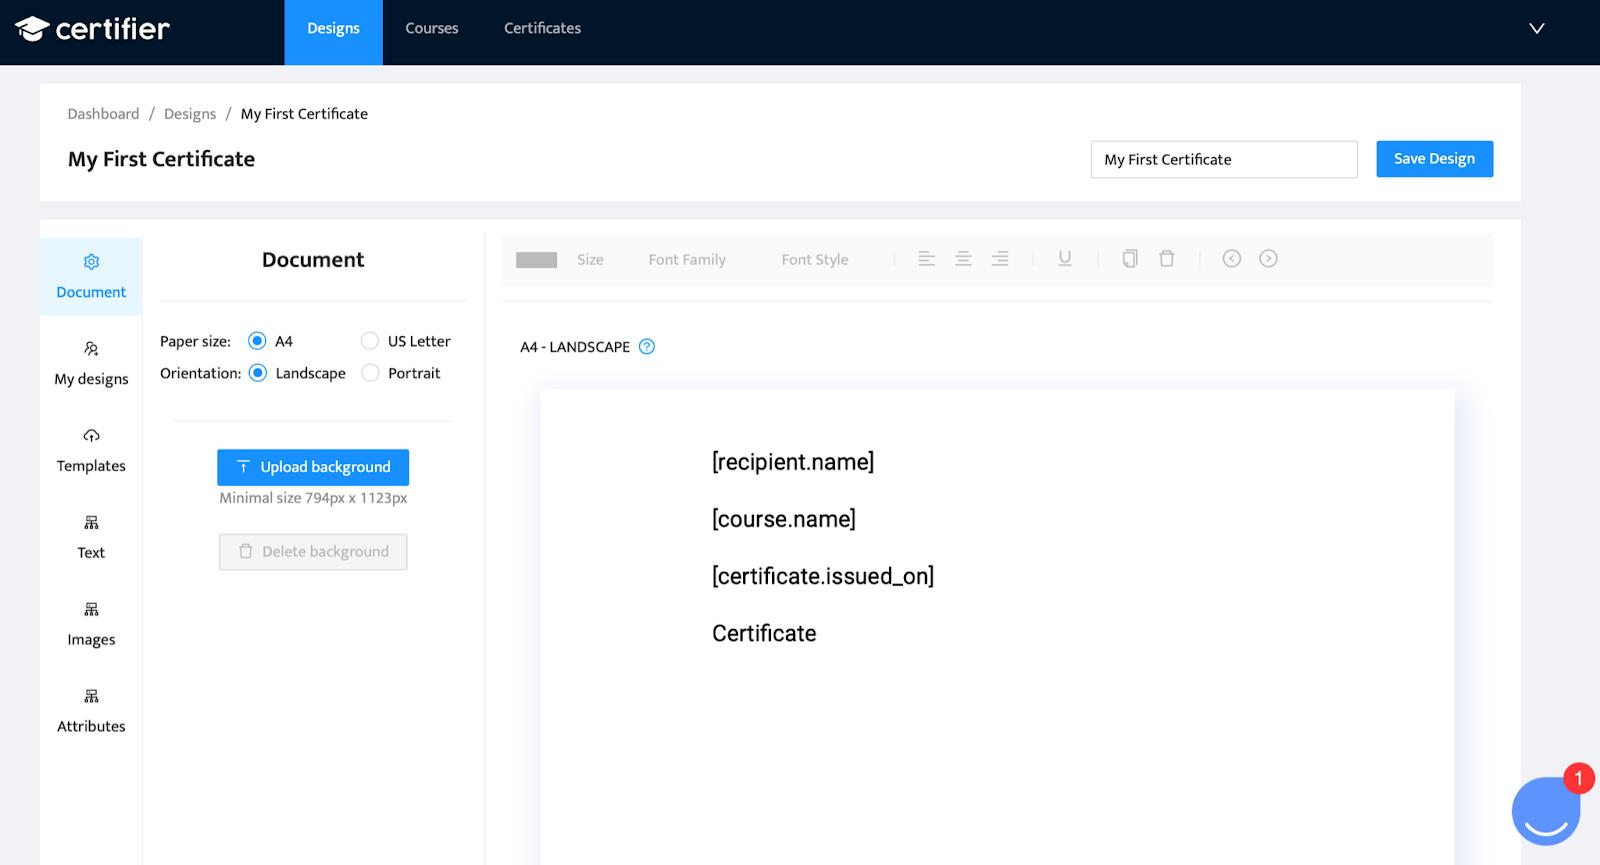 certifier dashboard - add attributes to new certificate design